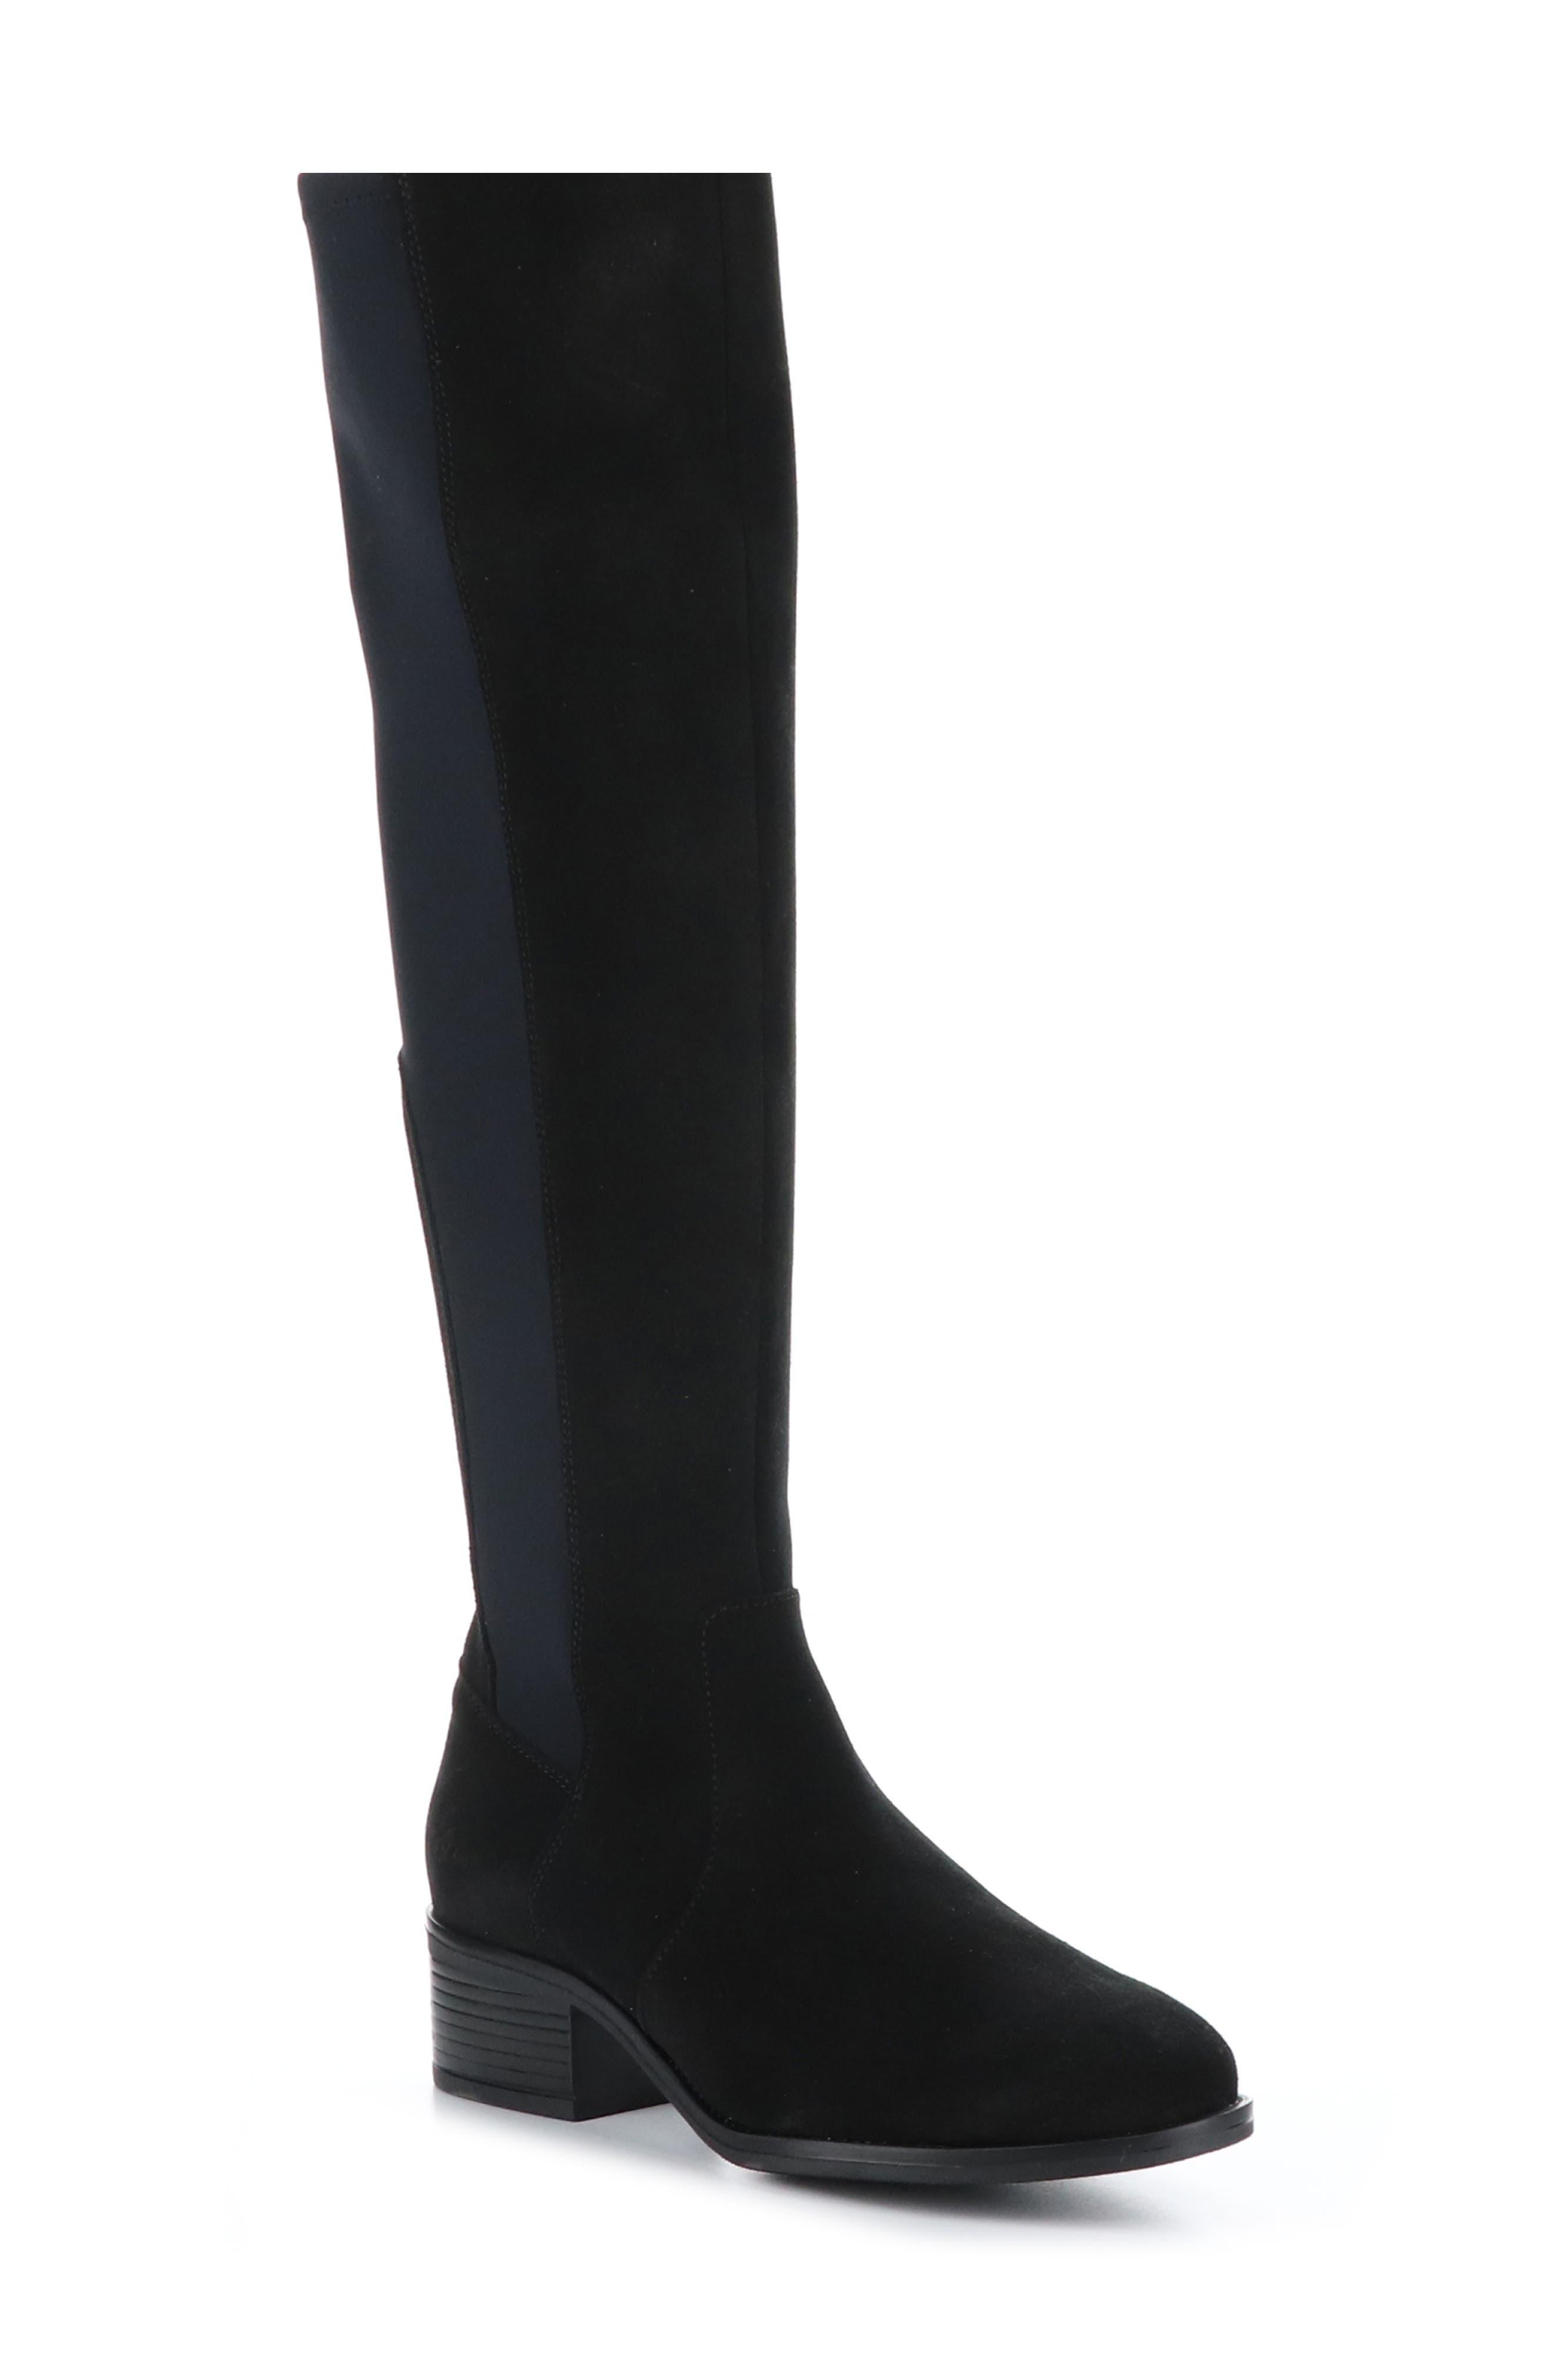 Jemmy Waterproof Over The Knee Boot